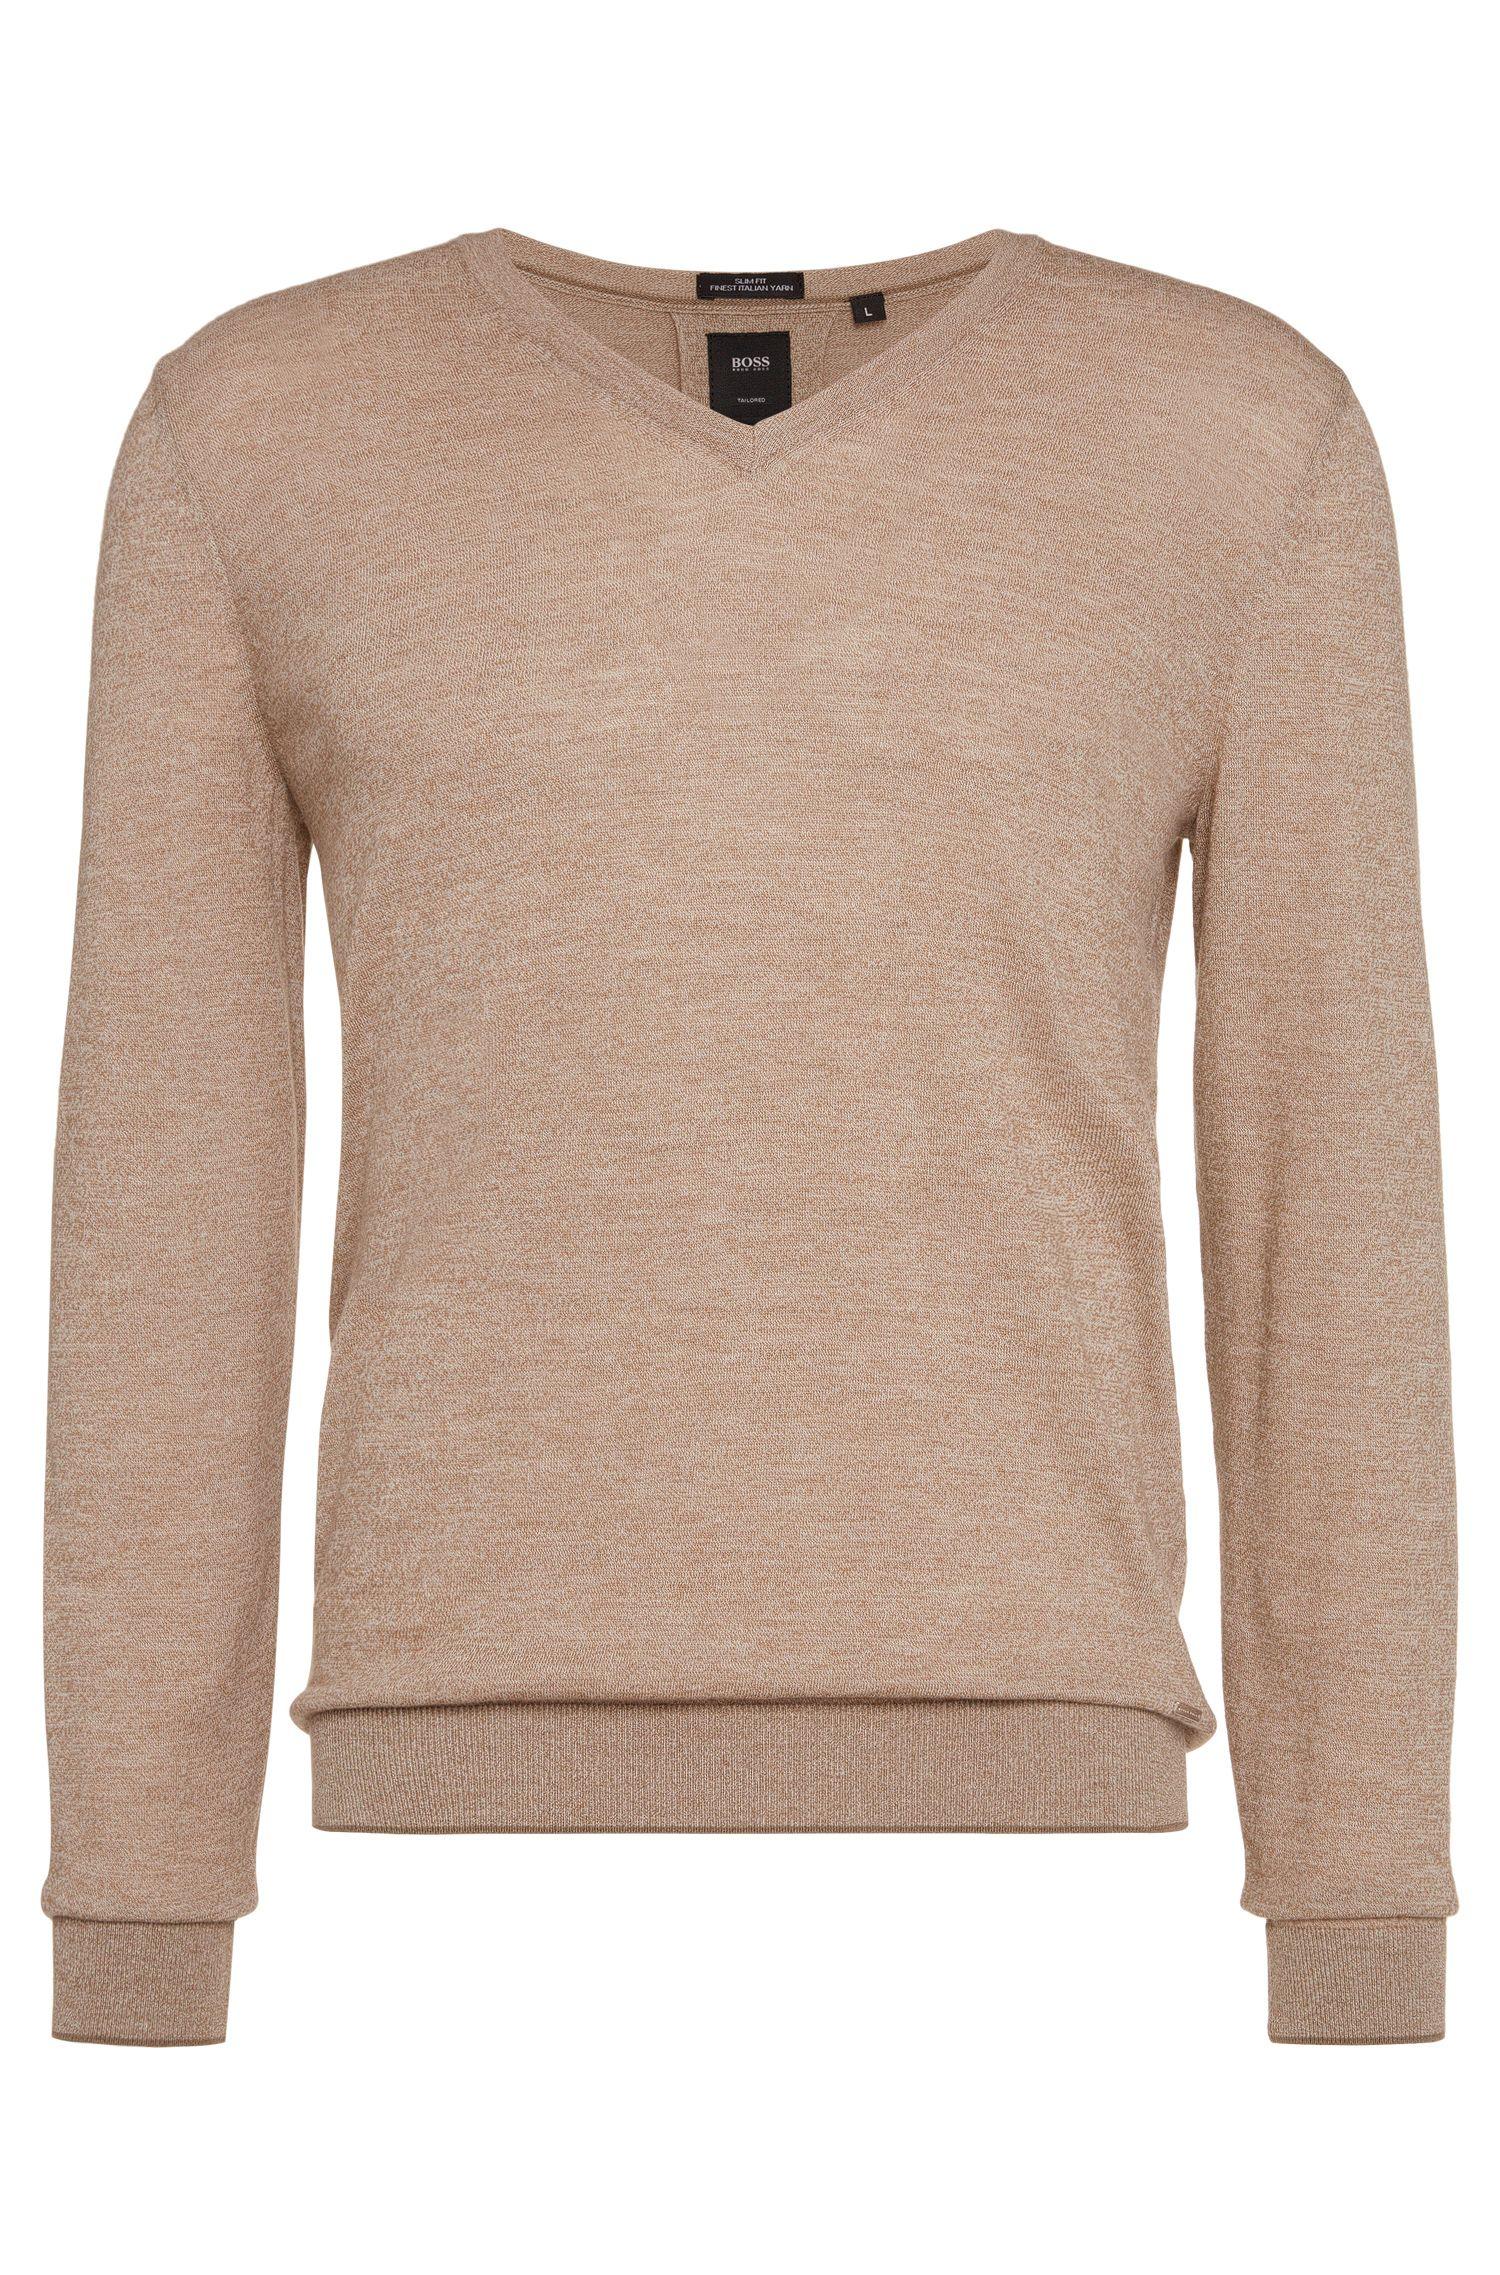 'T-Harrie' | V-Neck Italian Virgin Wool Cotton Sweater